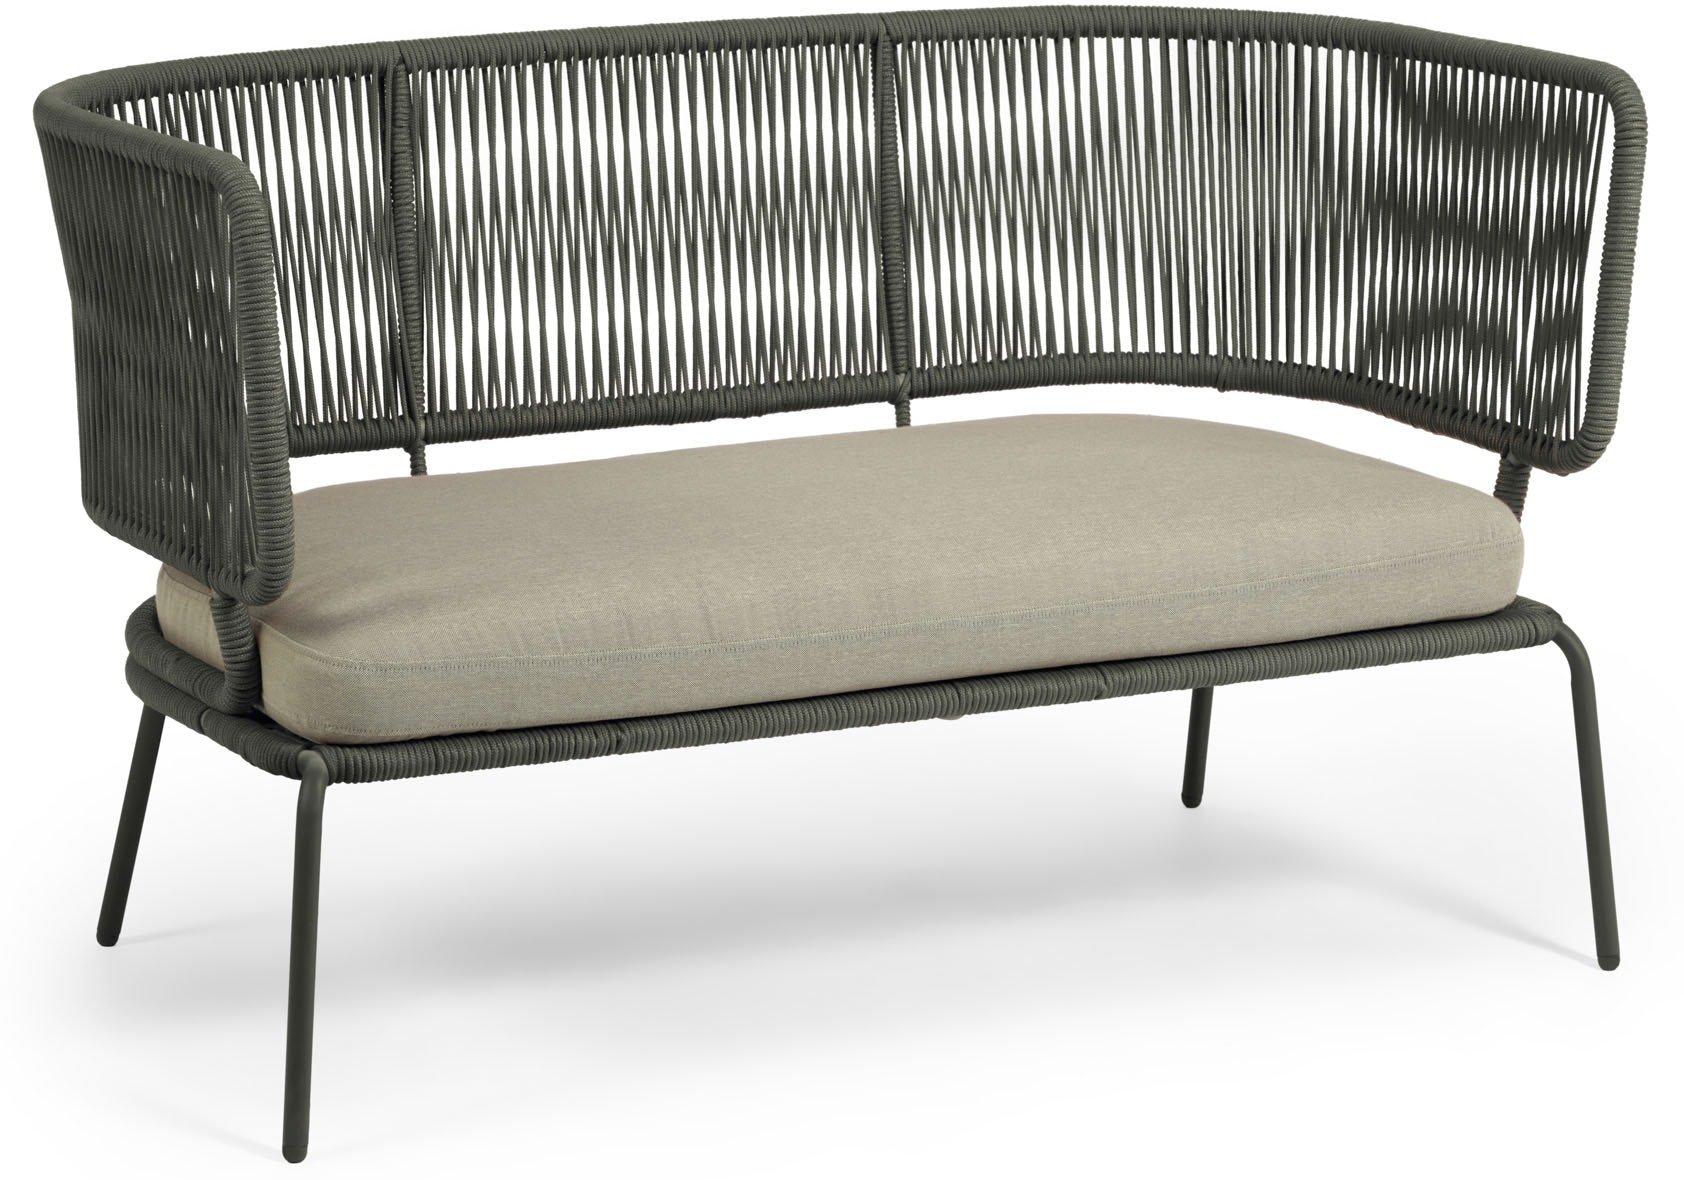 Nadin, Udendørs 2-personers sofa by LaForma (H: 80 cm. B: 135 cm. L: 65 cm., Grøn)